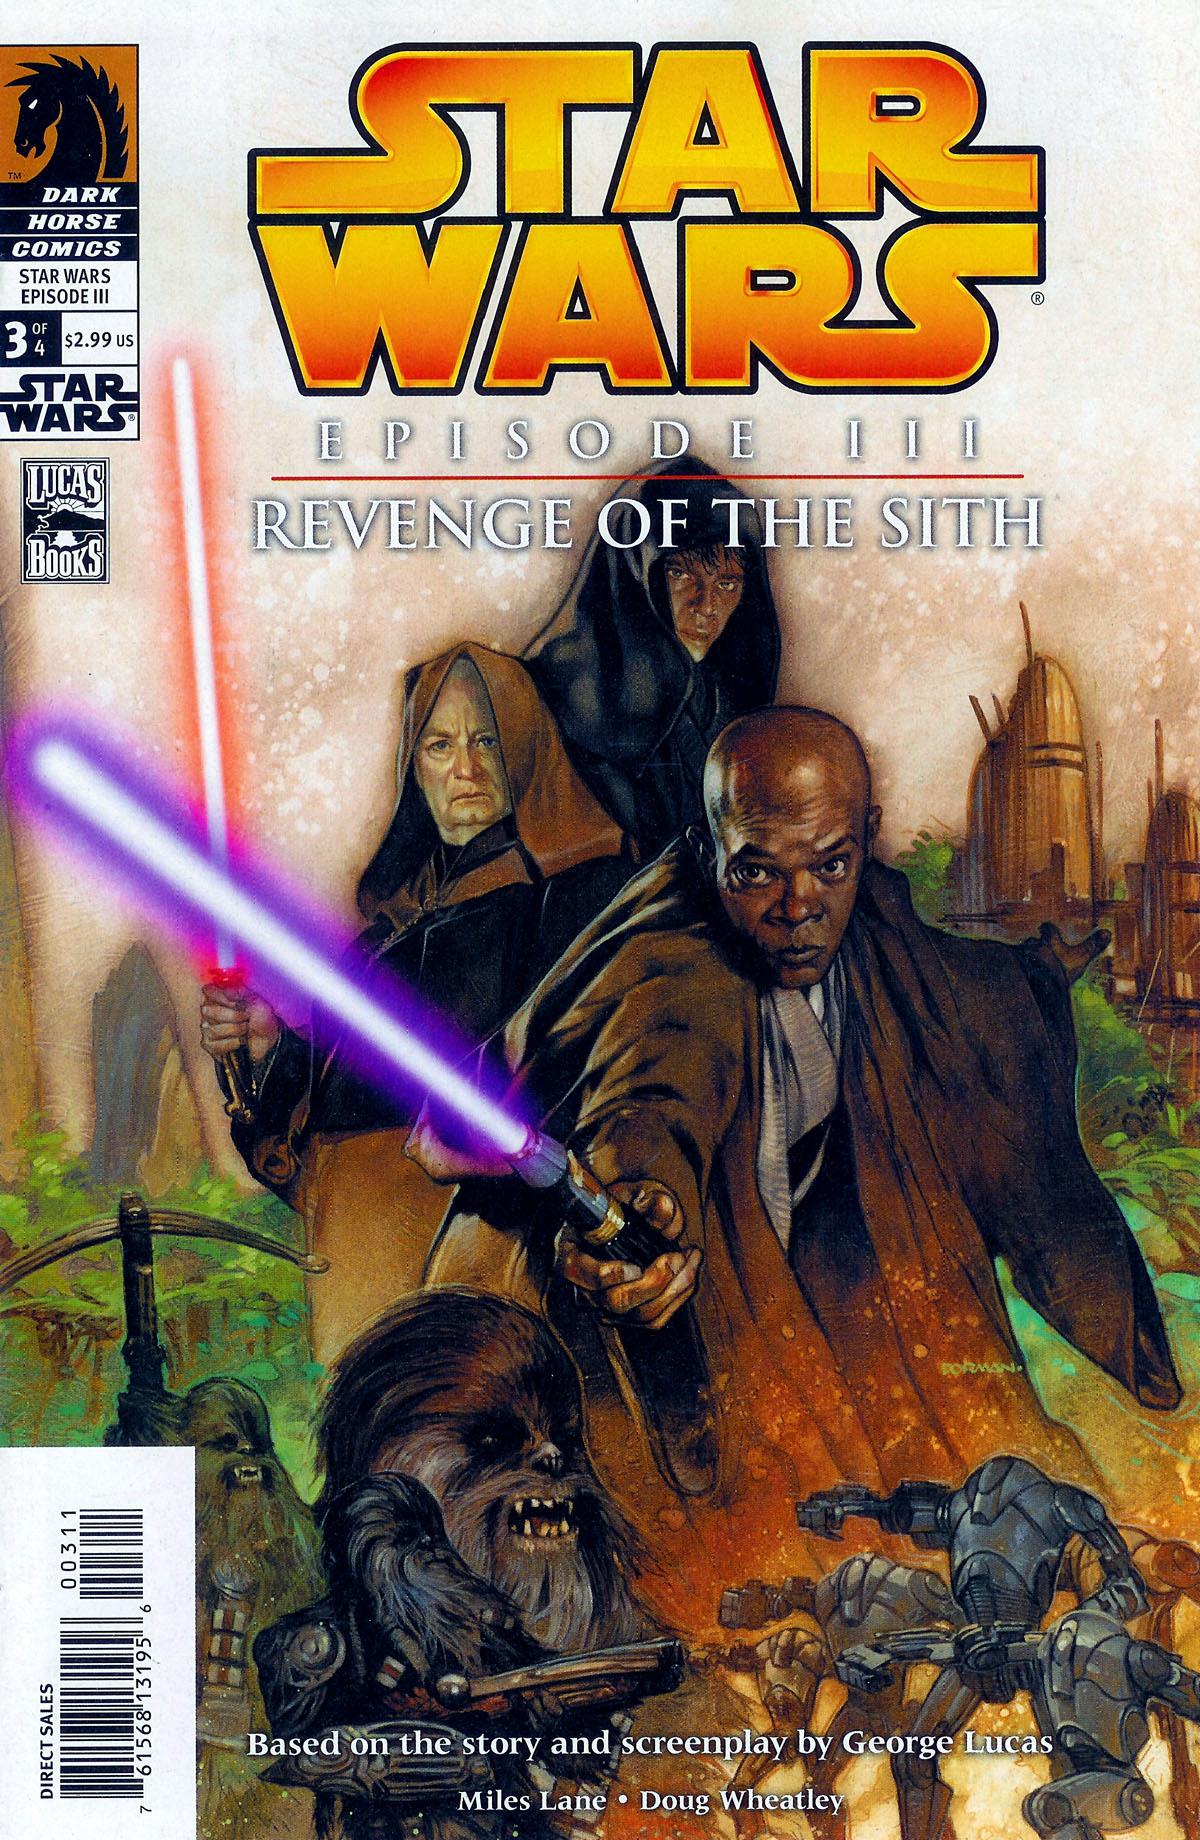 Star Wars Episode Iii Revenge Of The Sith 2005 3 Read Star Wars Episode Iii Revenge Of The Sith 2005 Issue 3 Online